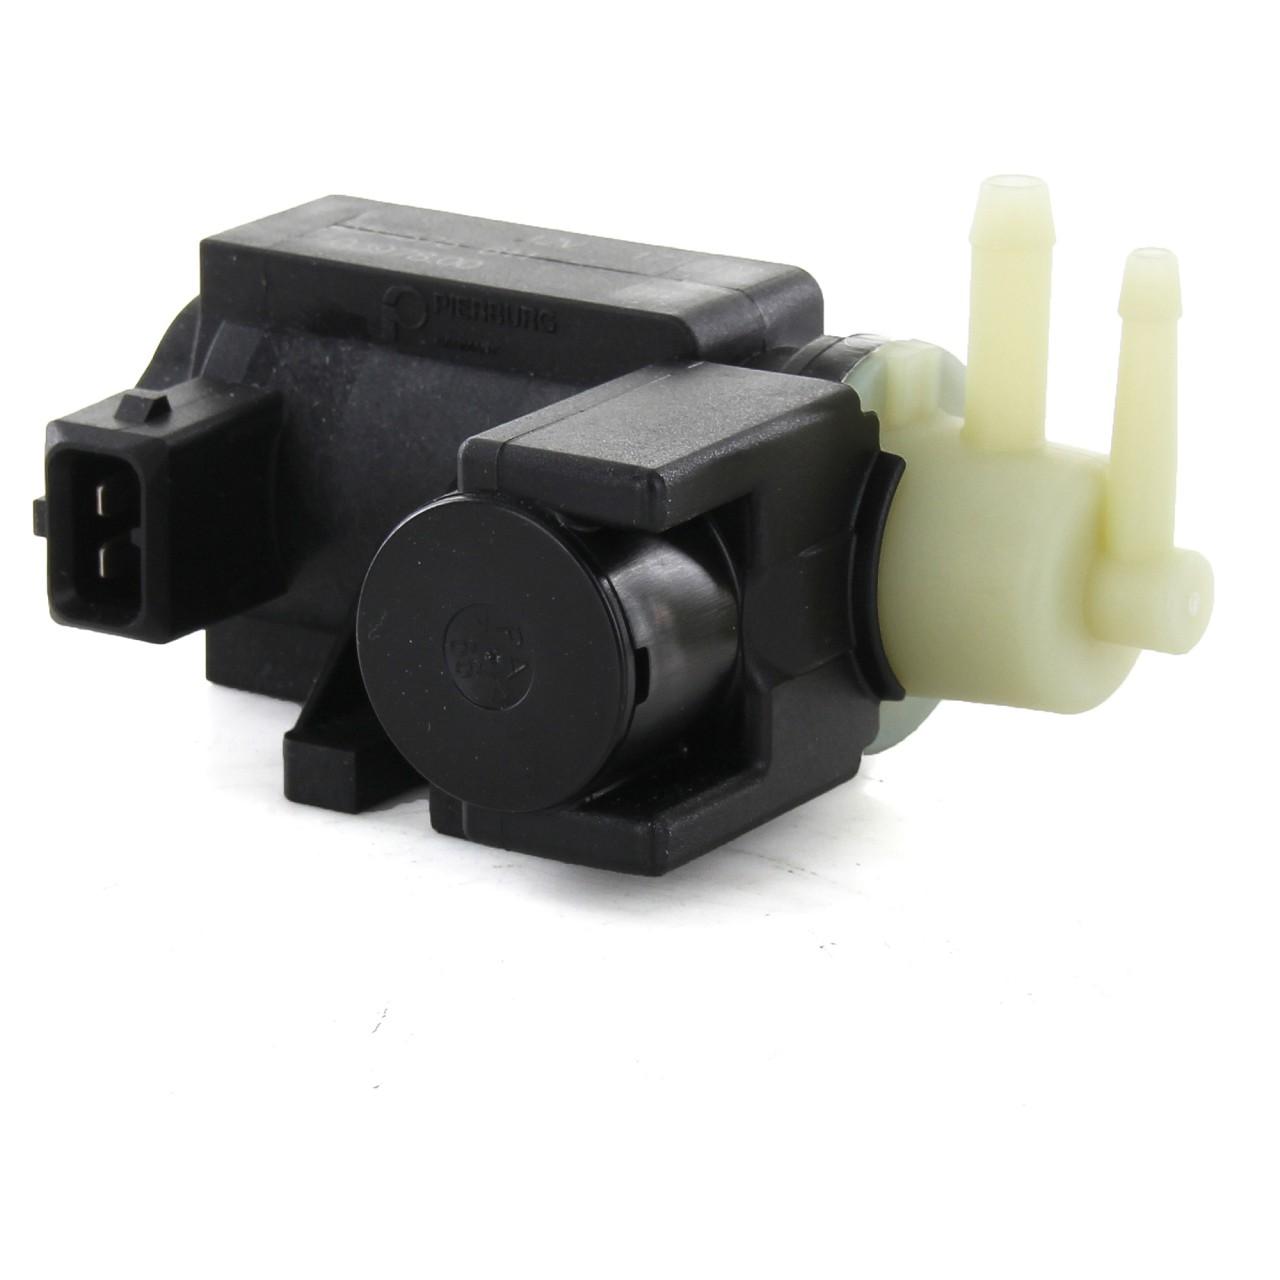 ORIGINAL GM Opel Unterdrucksensor Druckwandler Magnetventil Turbolader 851017